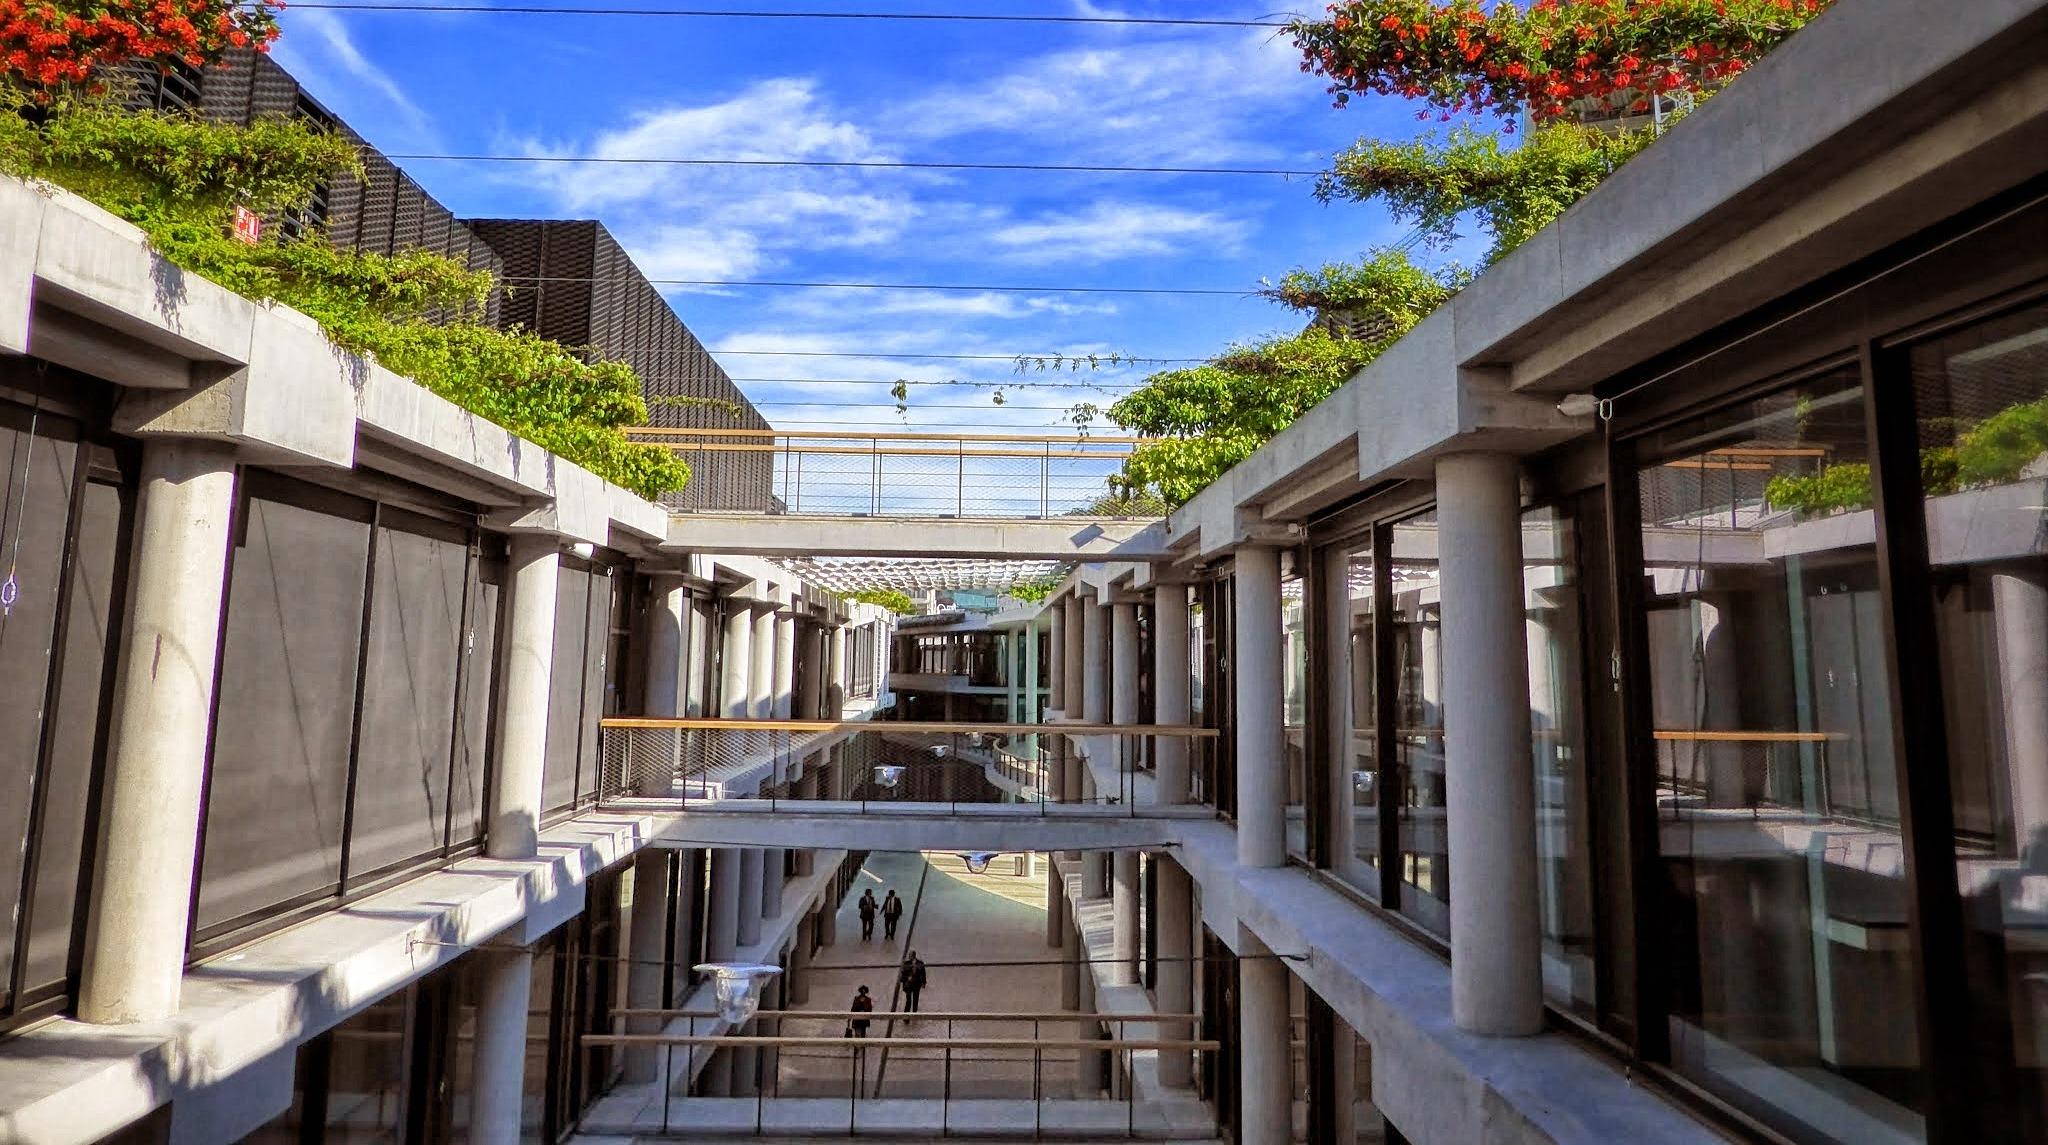 https://shareholdersandinvestors.bbva.com/wp-content/uploads/2017/05/plantas-colgantes-ciudad-bbva.jpg